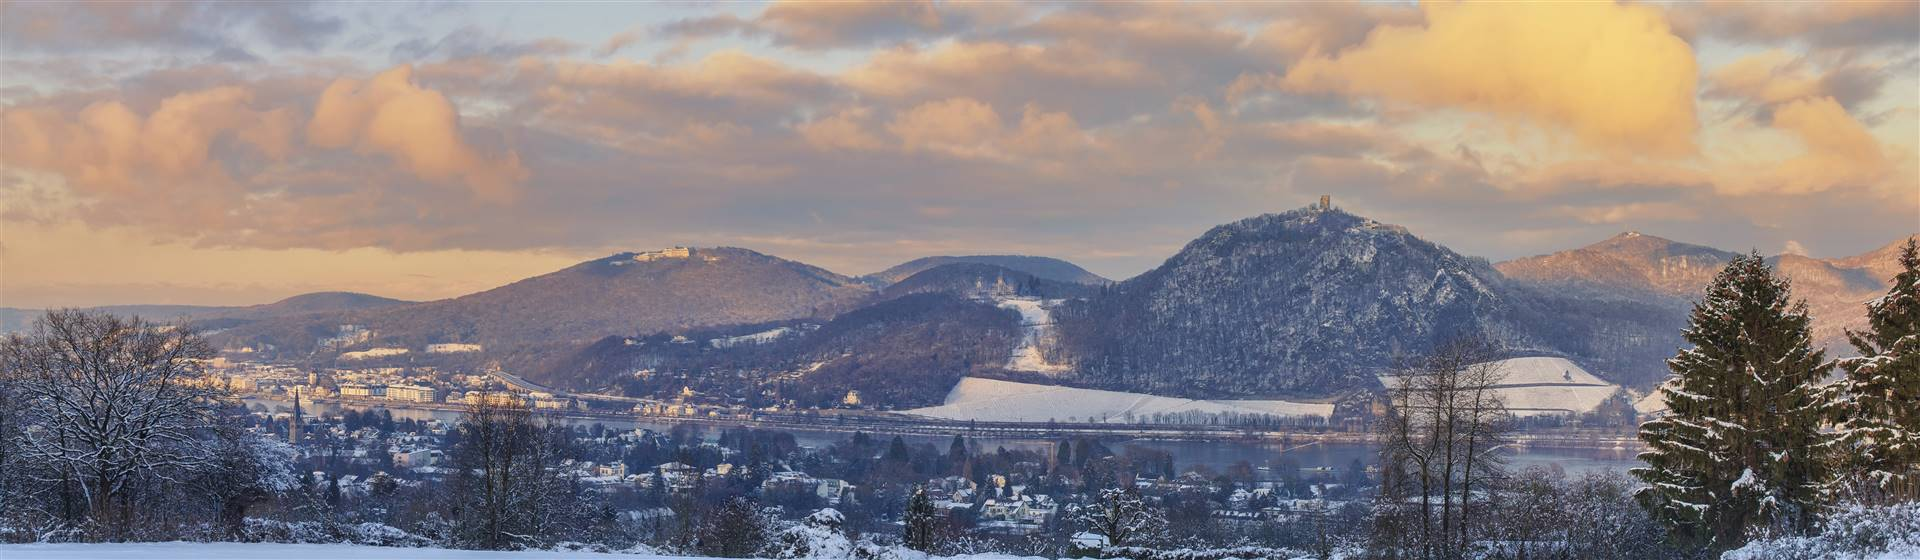 "<img src=""frhwg2020-adobestock_248549899.jpeg"" alt=""Winter Panorama near Remagen"">"